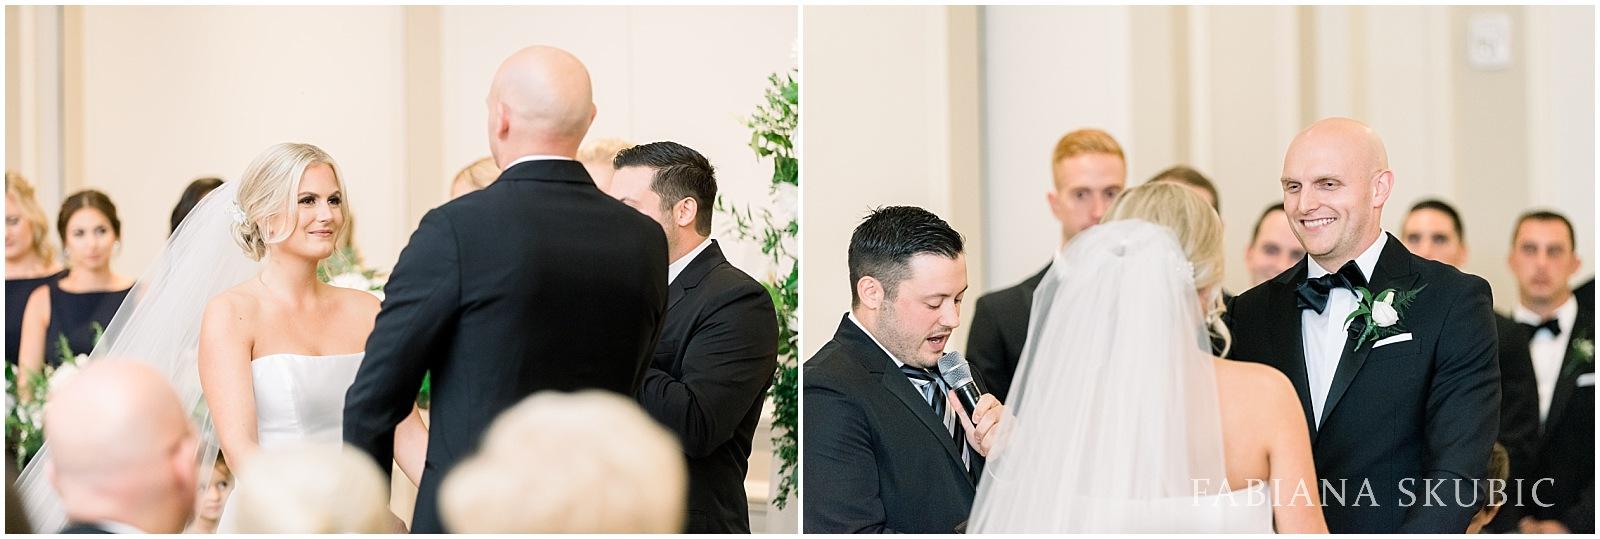 MT-Raleigh-Wedding-Photographer-FSP (63).jpg